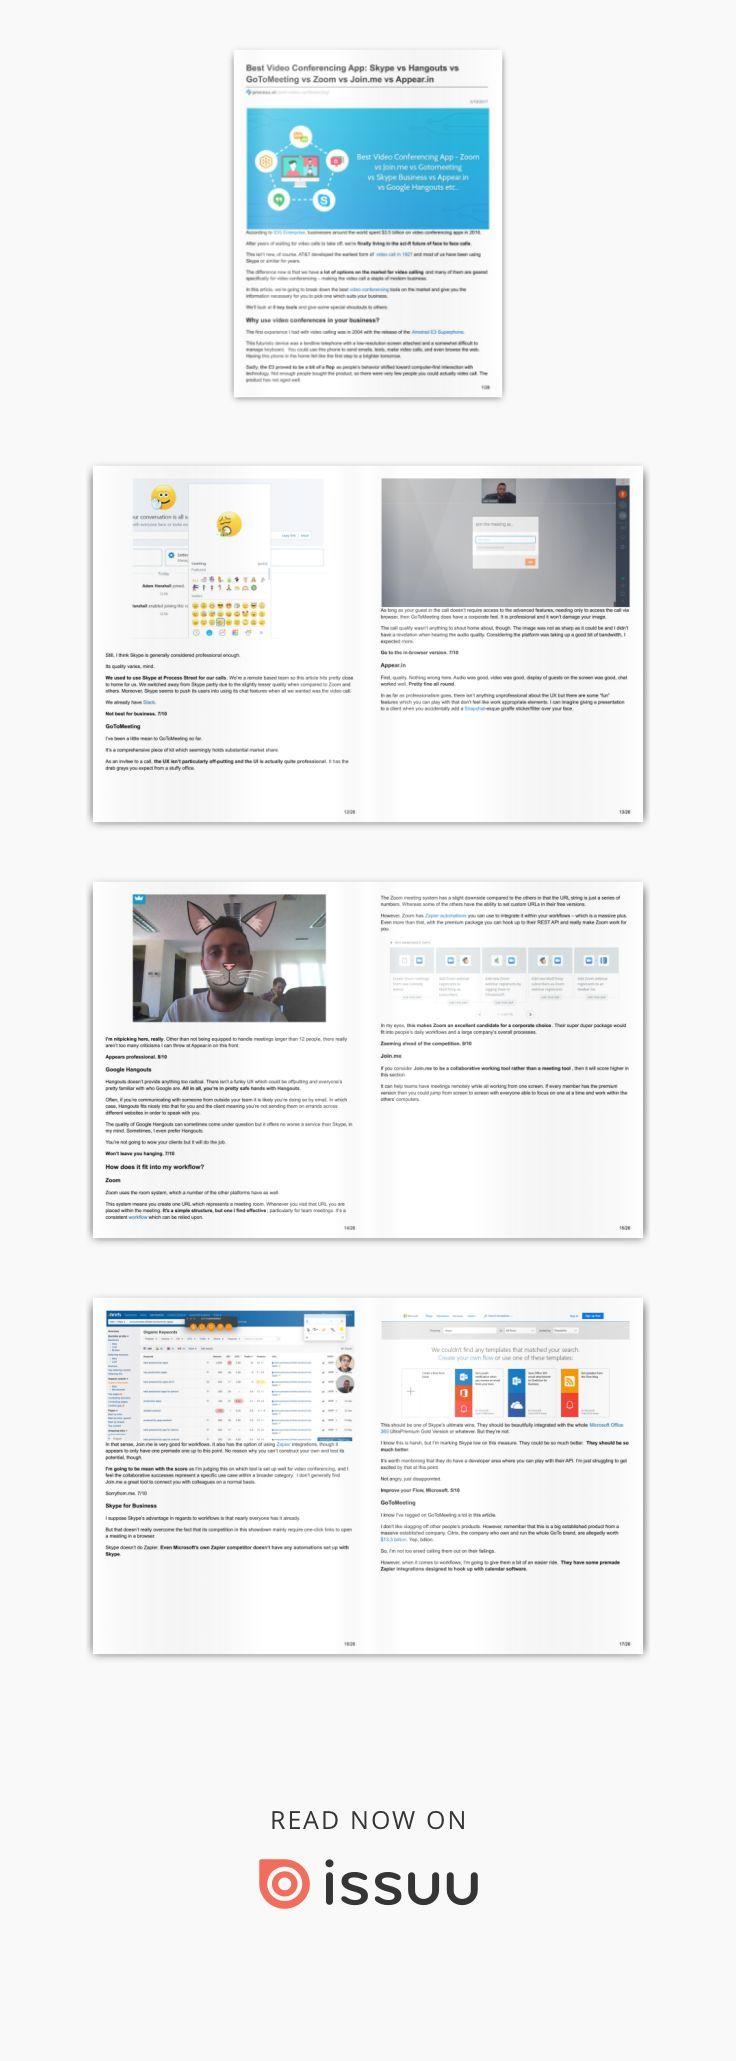 Best Video Conferencing App Skype vs Hangouts vs